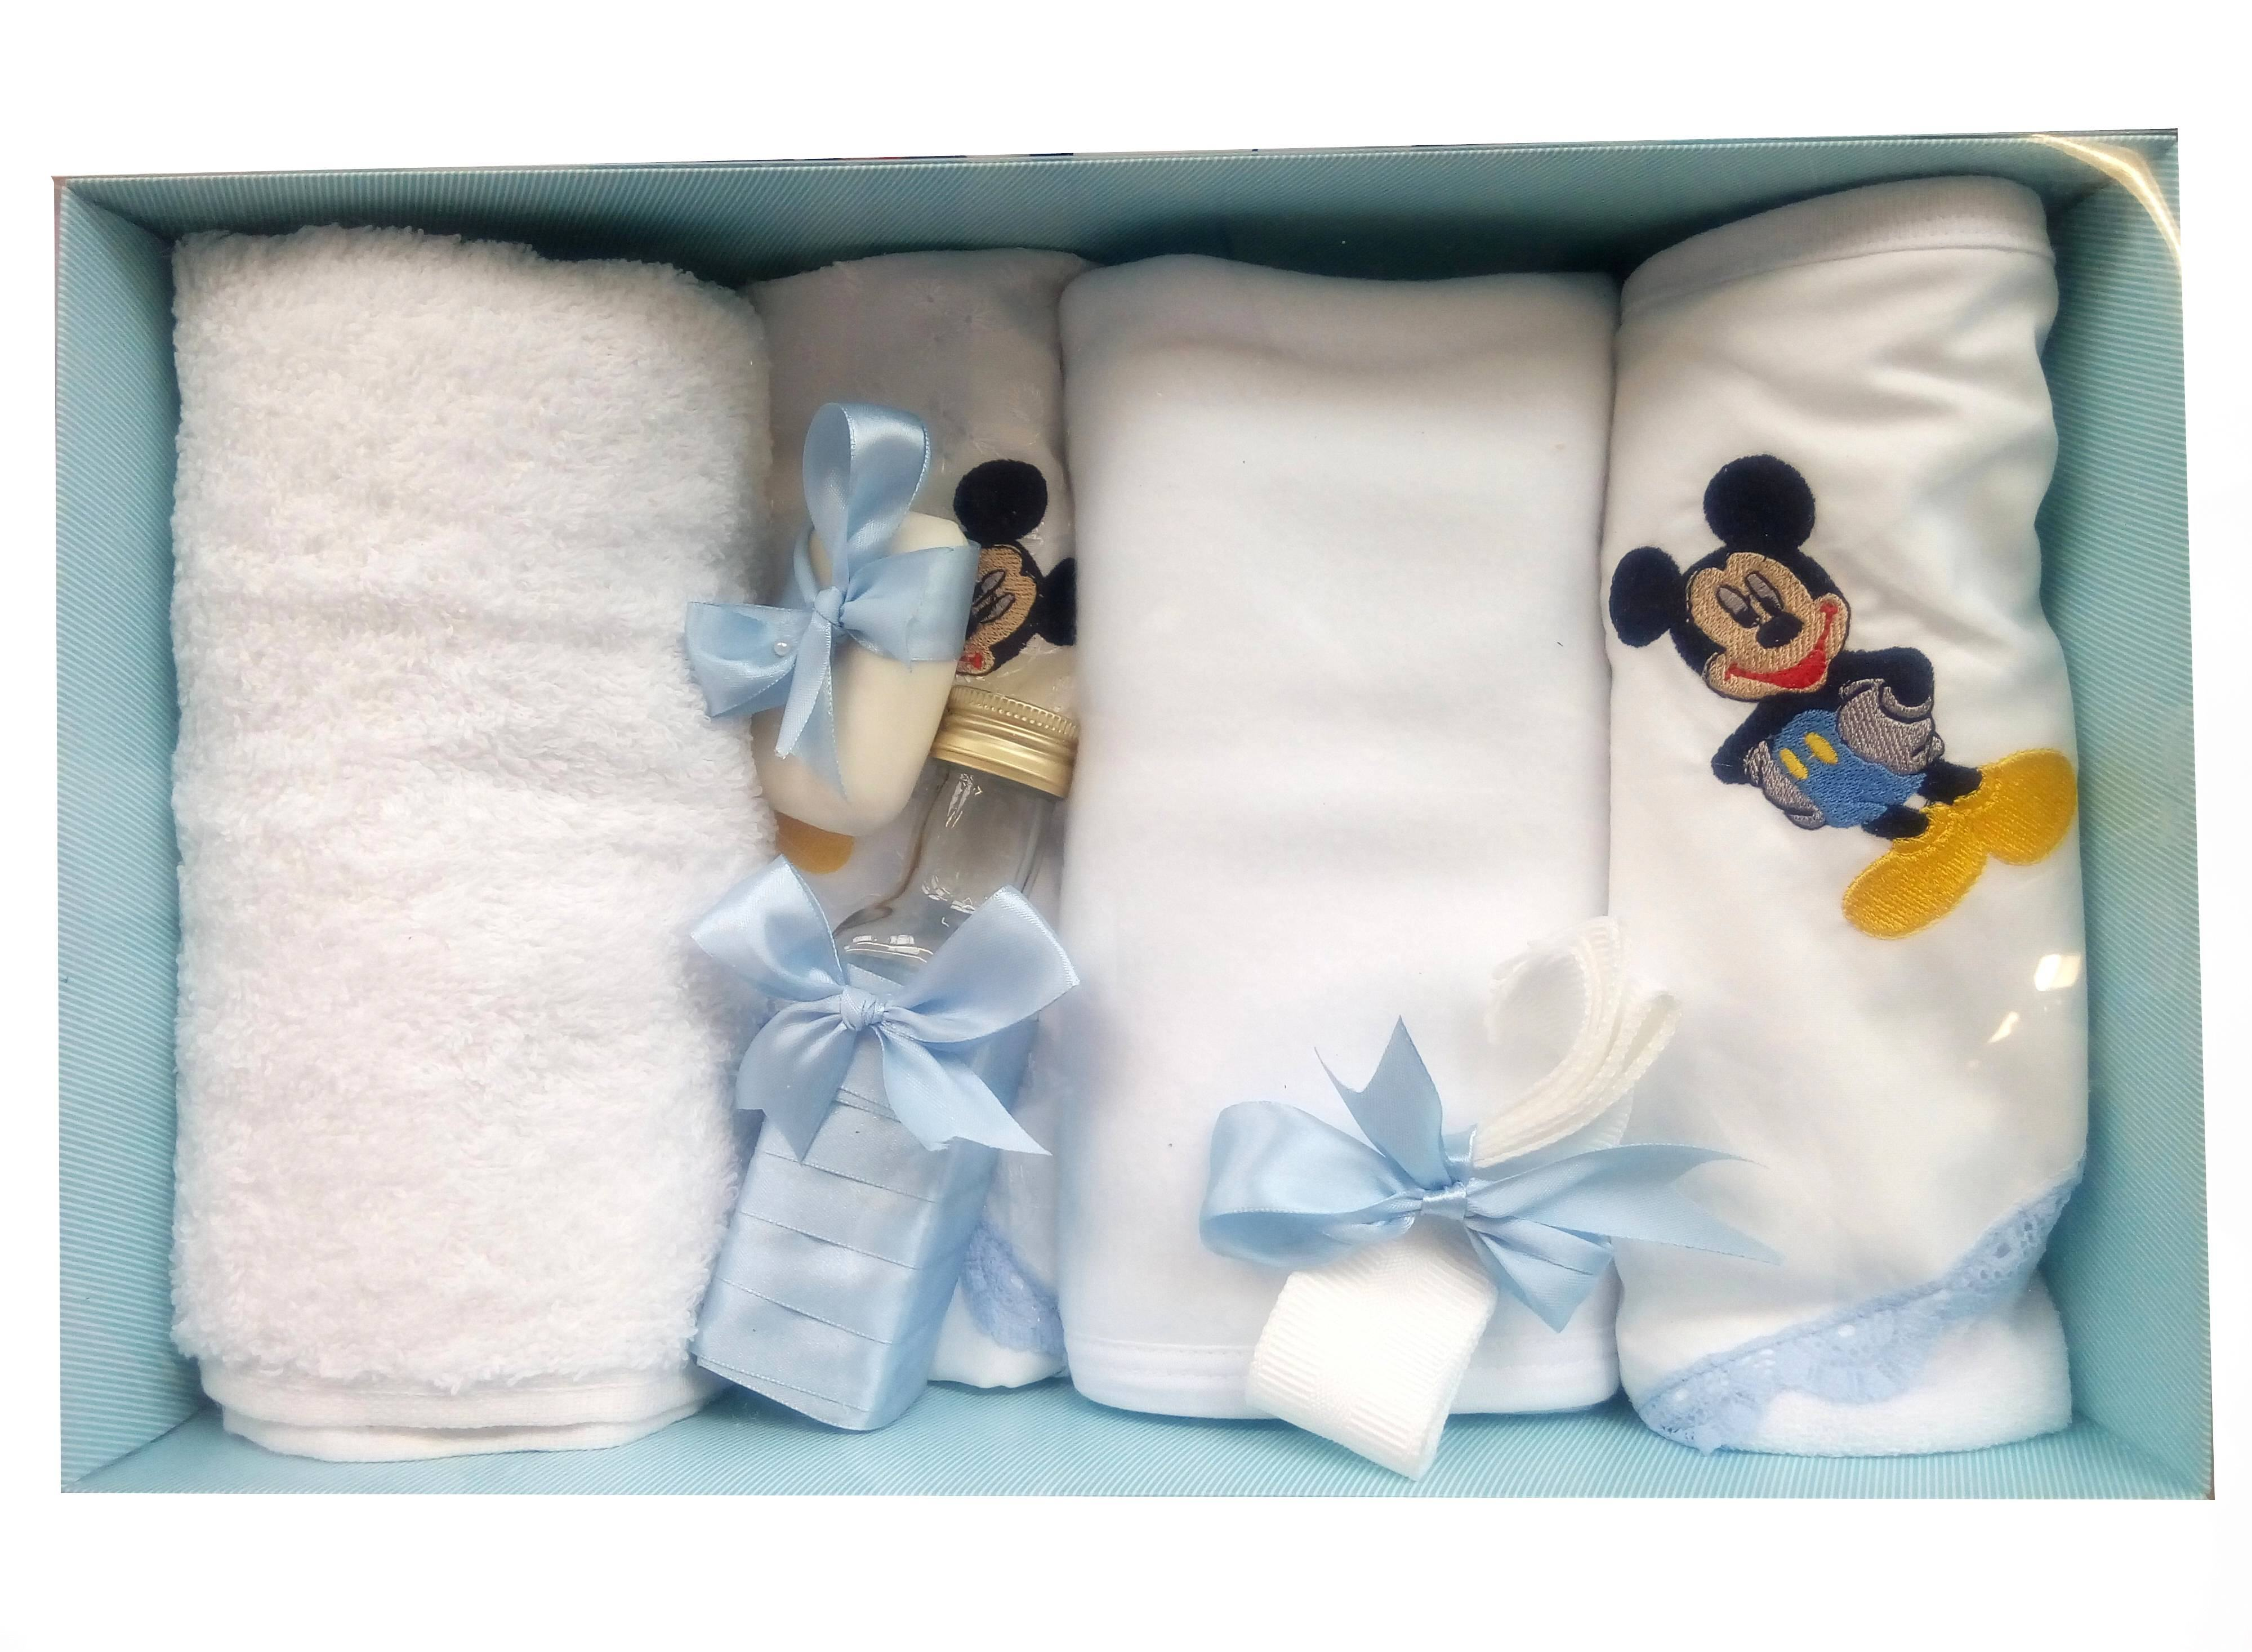 Trusou botez personalizat baieti cu Mikey Mouse - set complet biserica TB99154